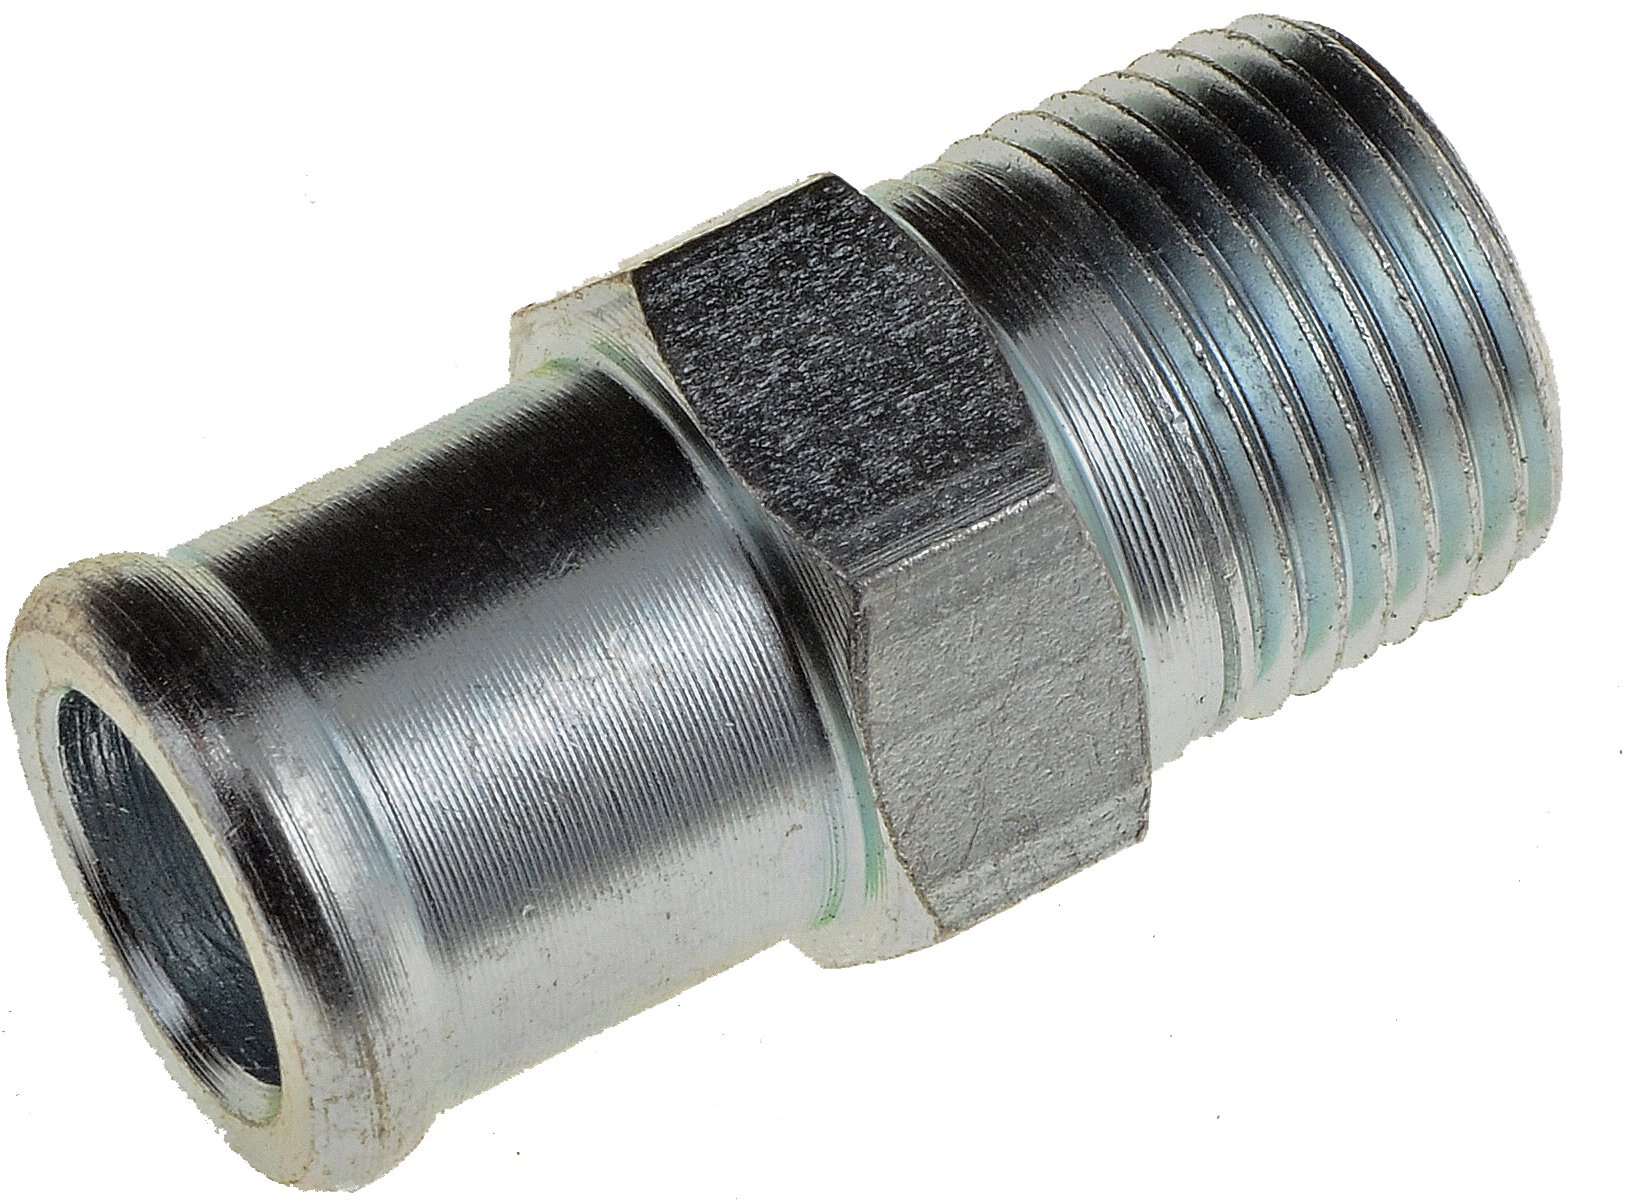 "Dorman HELP Heater Hose Connectors 5//8/"" Hose x 1//2/"" Npt x 1-1//2/"" Long Ni 56356"